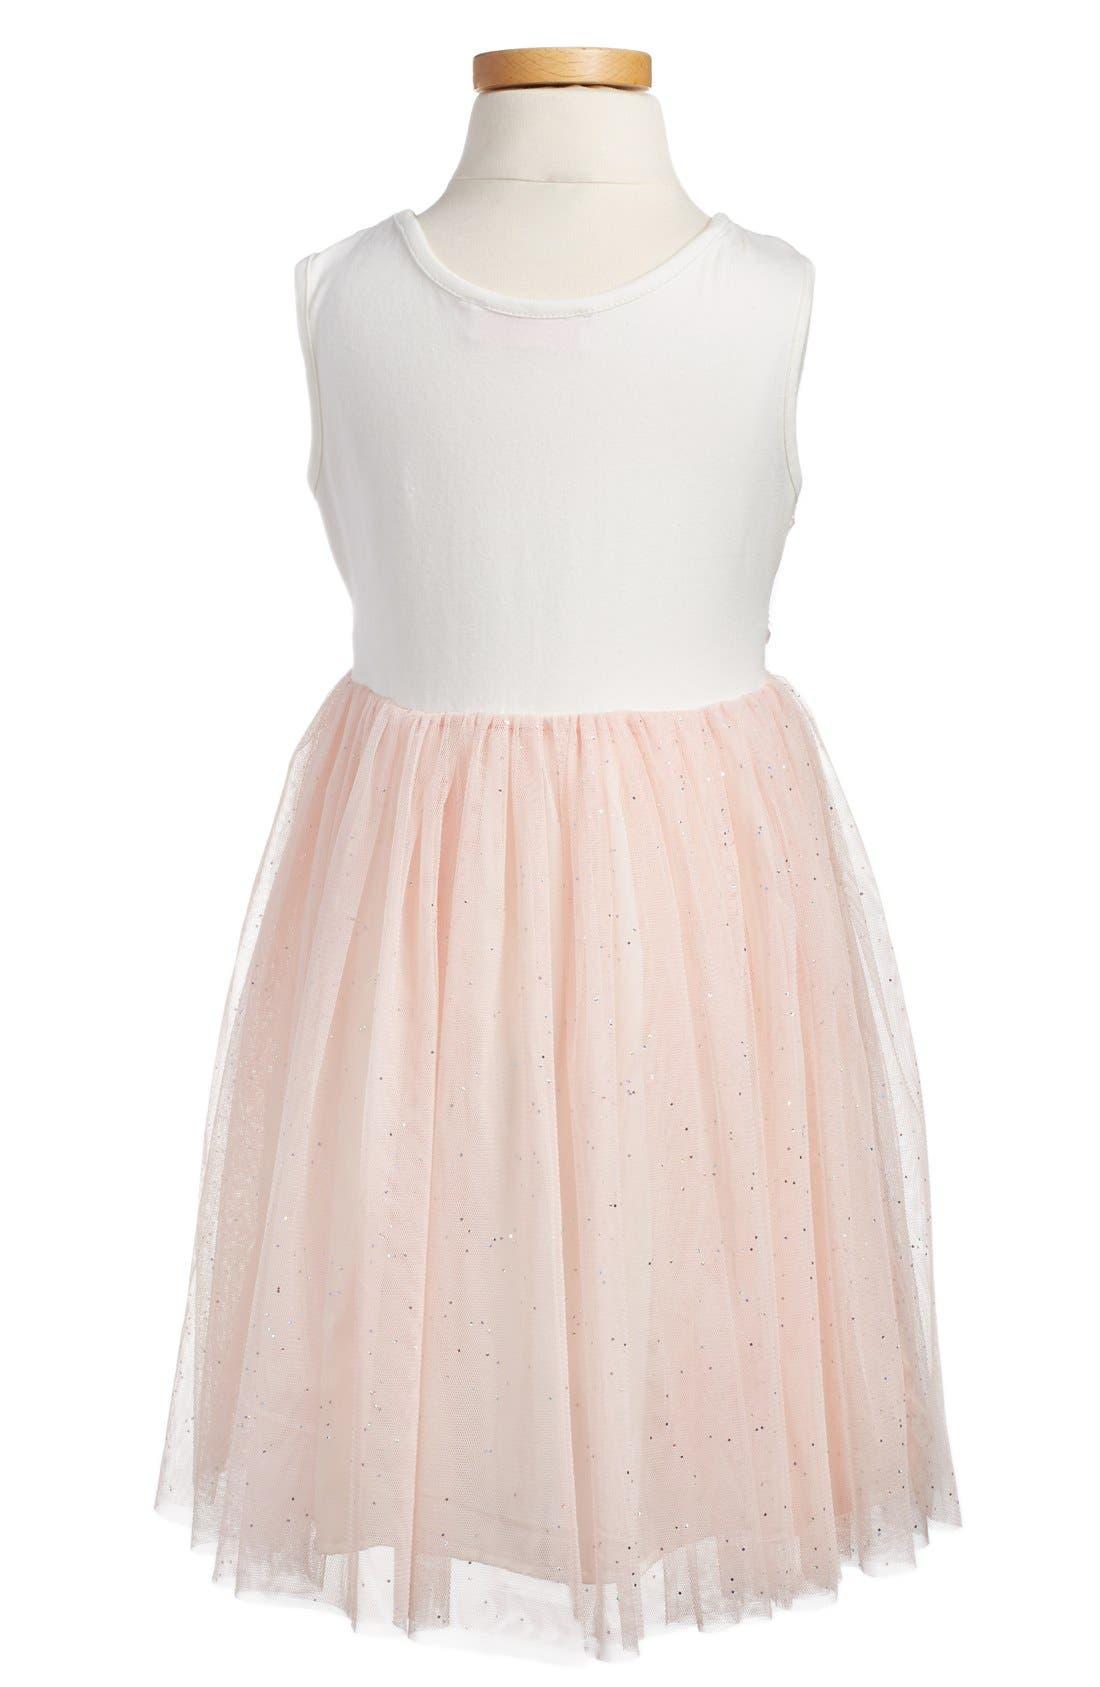 Alternate Image 2  - Popatu Embroidered Tulle Dress (Toddler Girls, Little Girls & Big Girls)